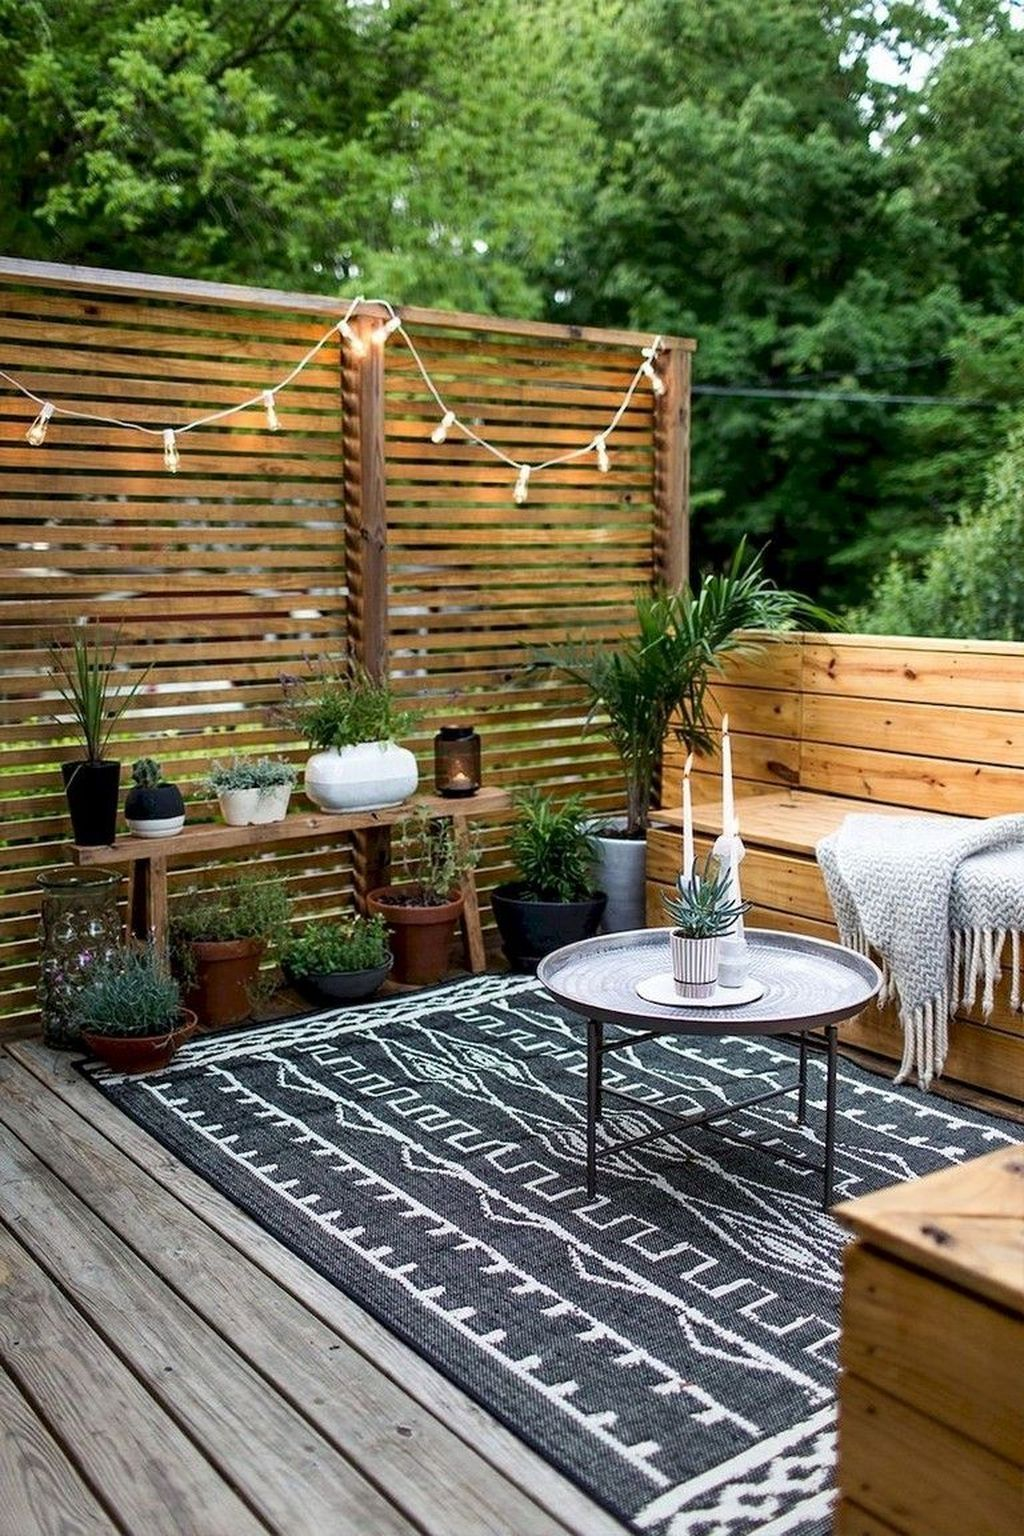 42 Popular Small Backyard Patio Design Ideas #backyardpatiodesigns